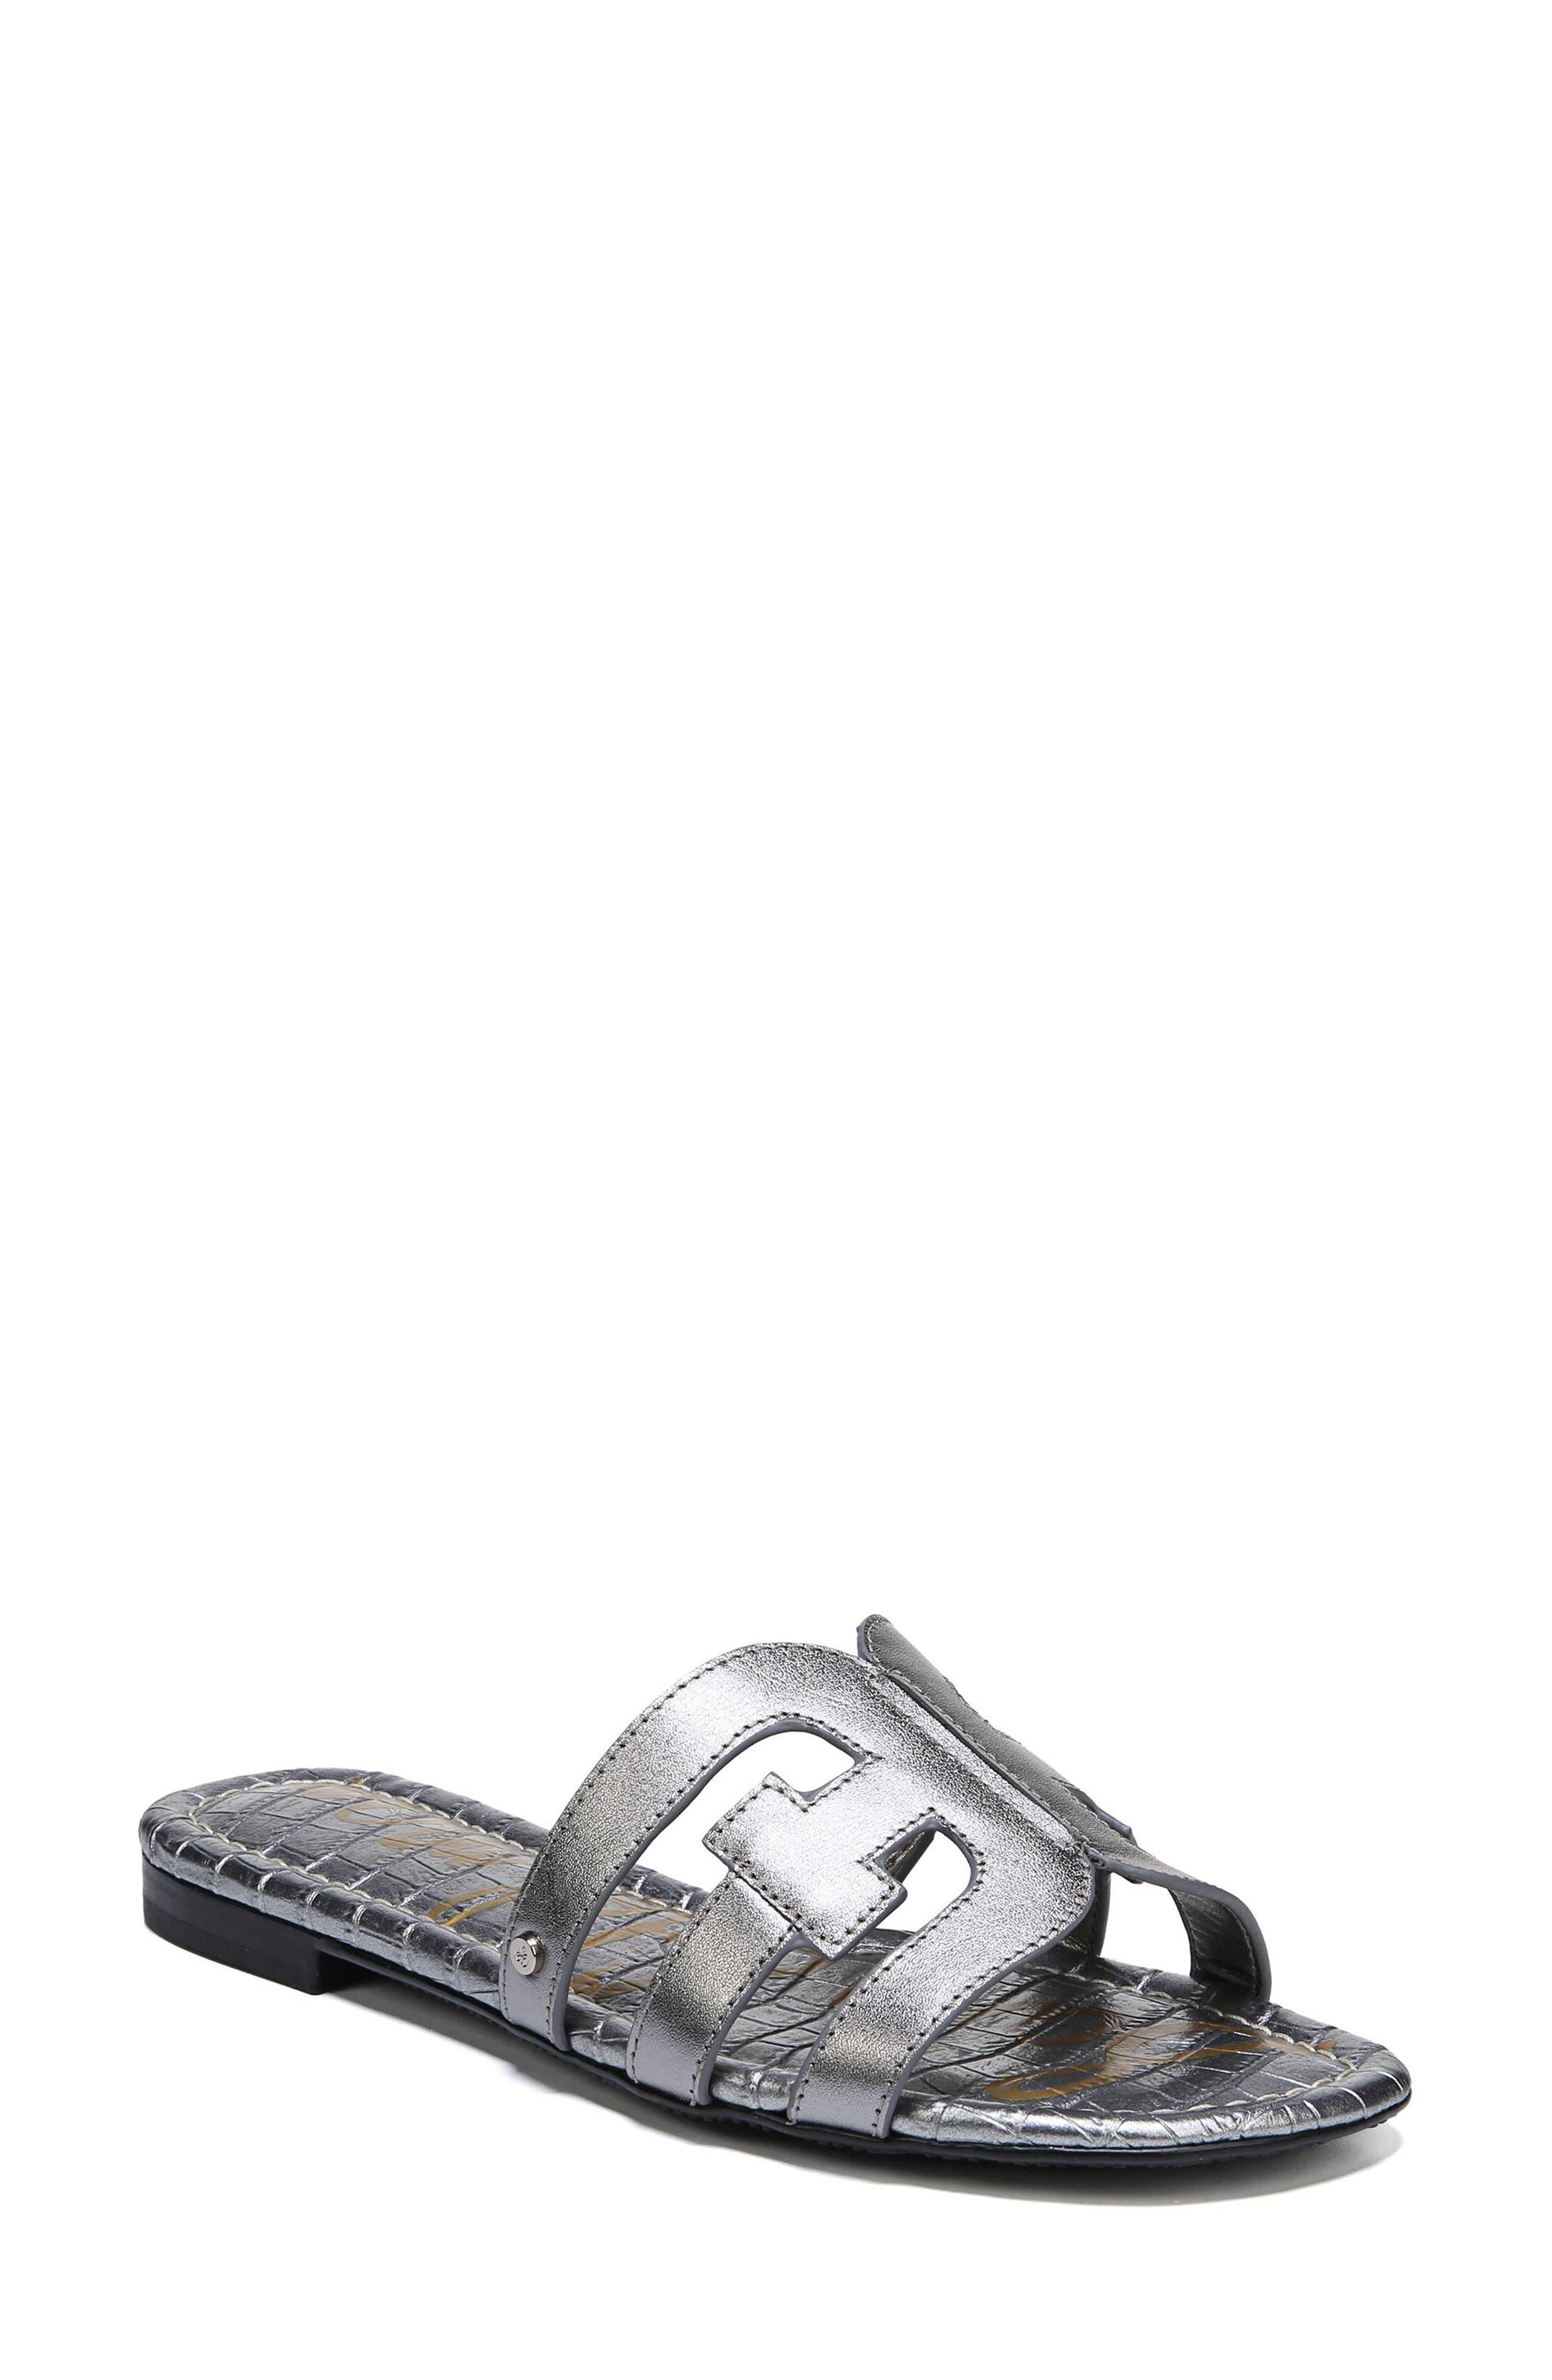 Bay Cutout Slide Sandal,                         Main,                         color, PEWTER LEATHER